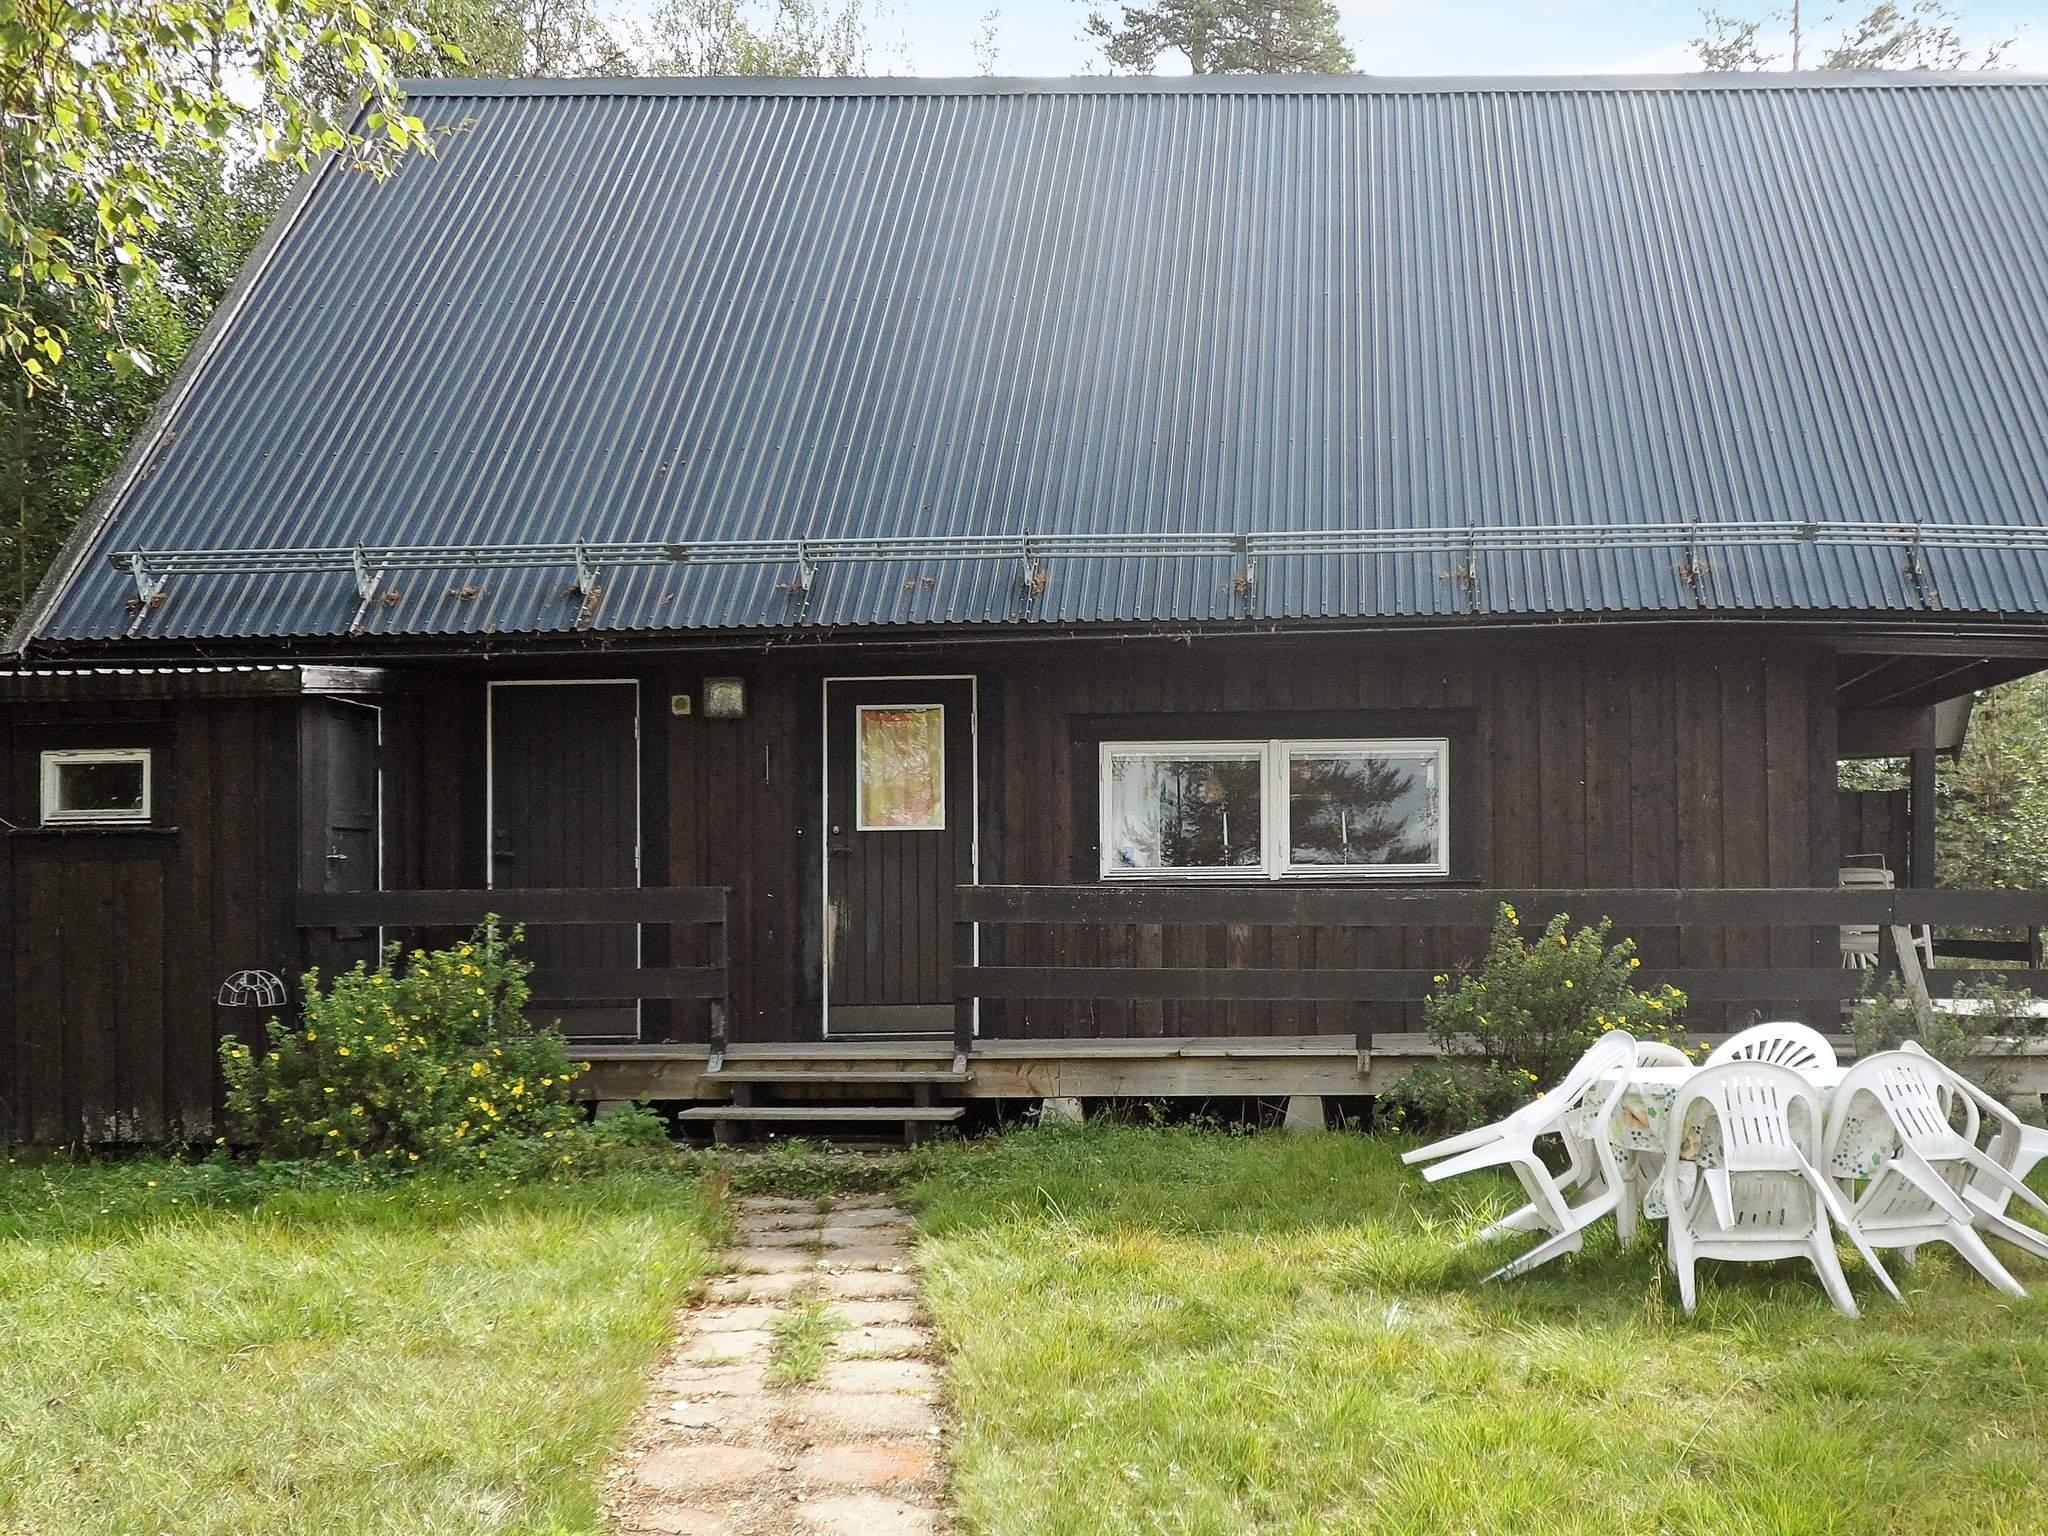 Ferienhaus Nordmaling (1026050), Lögdeå, Västerbottens län, Nordschweden, Schweden, Bild 15